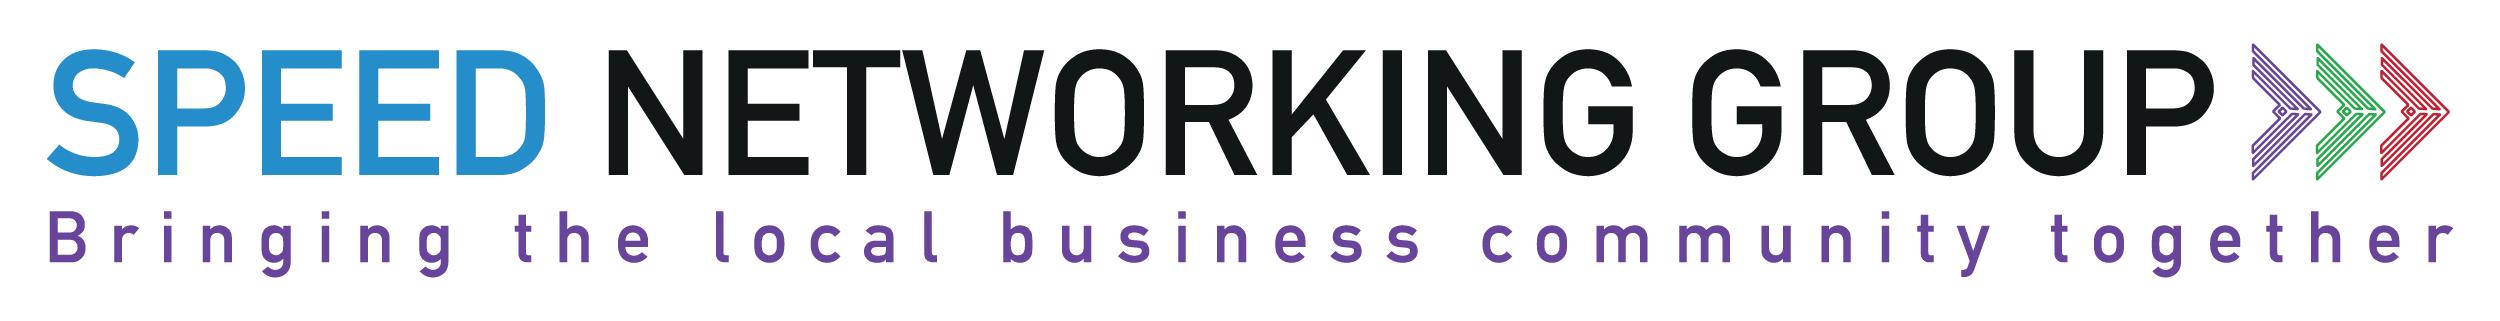 Speed Networking Group, Findusonweb